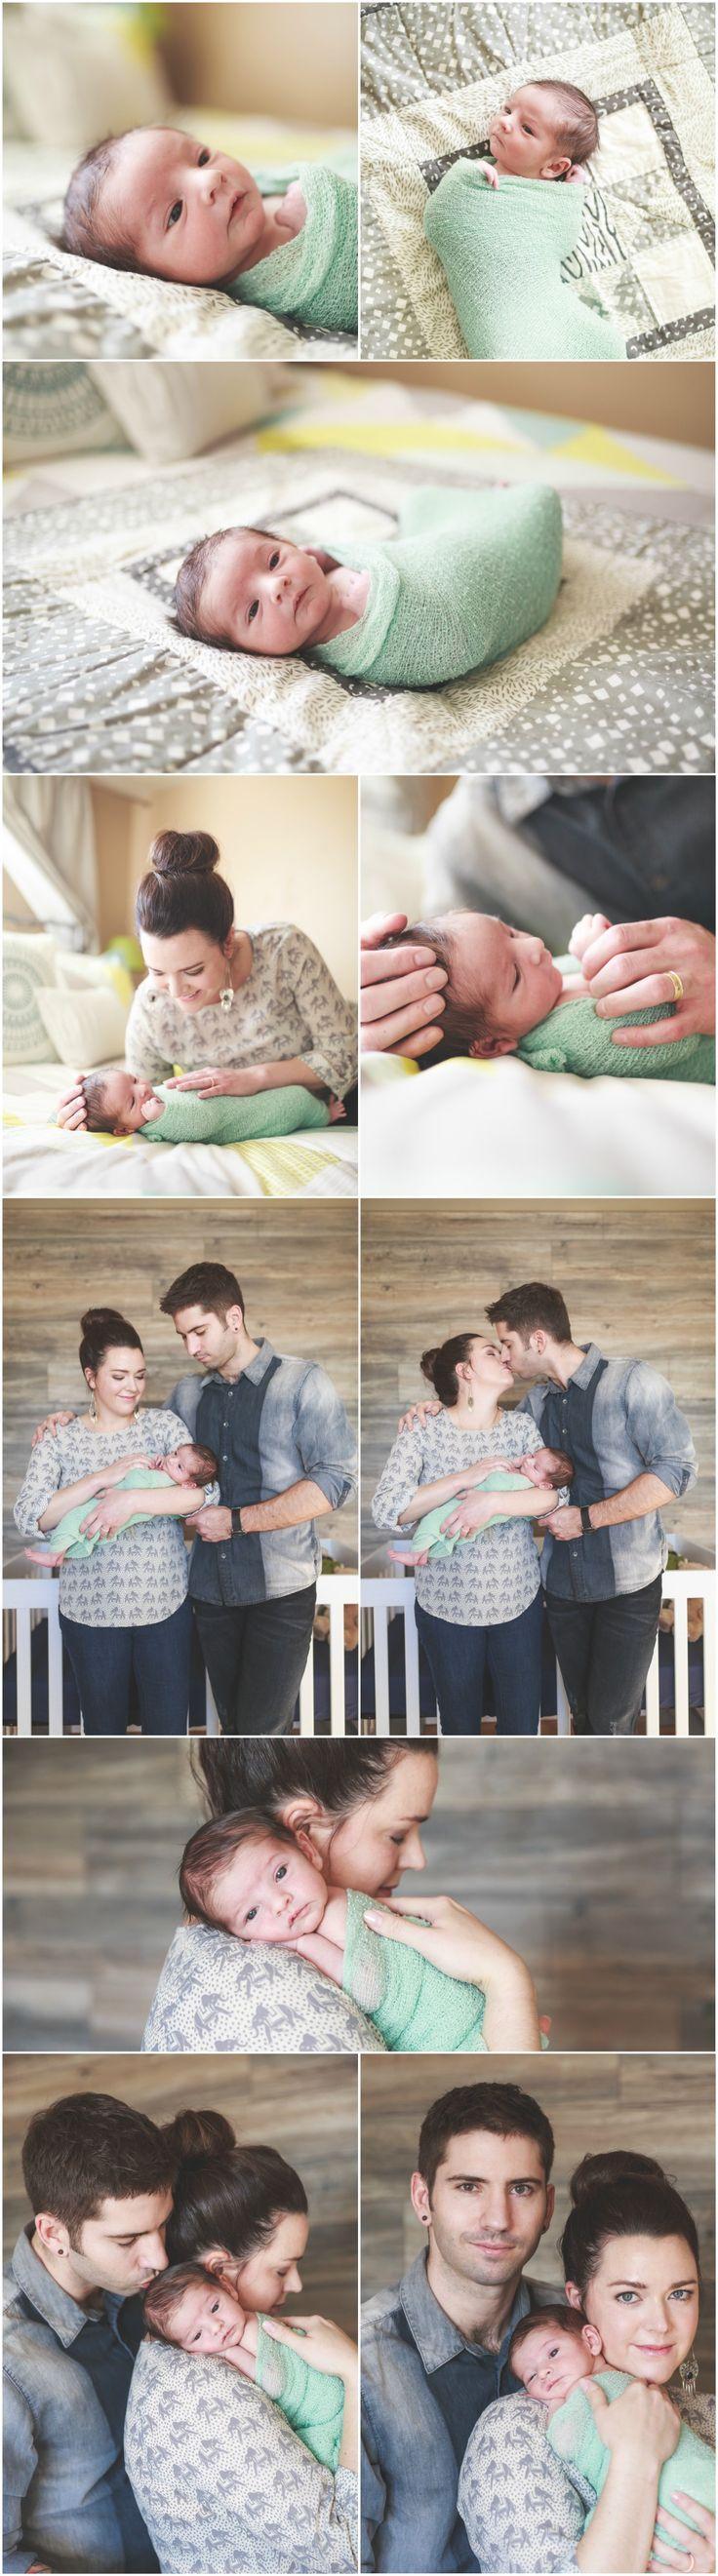 Newborn Photography Ideas and Inspiration   Newborn Poses   Denver Newborn Photographers   Newborn Portraits